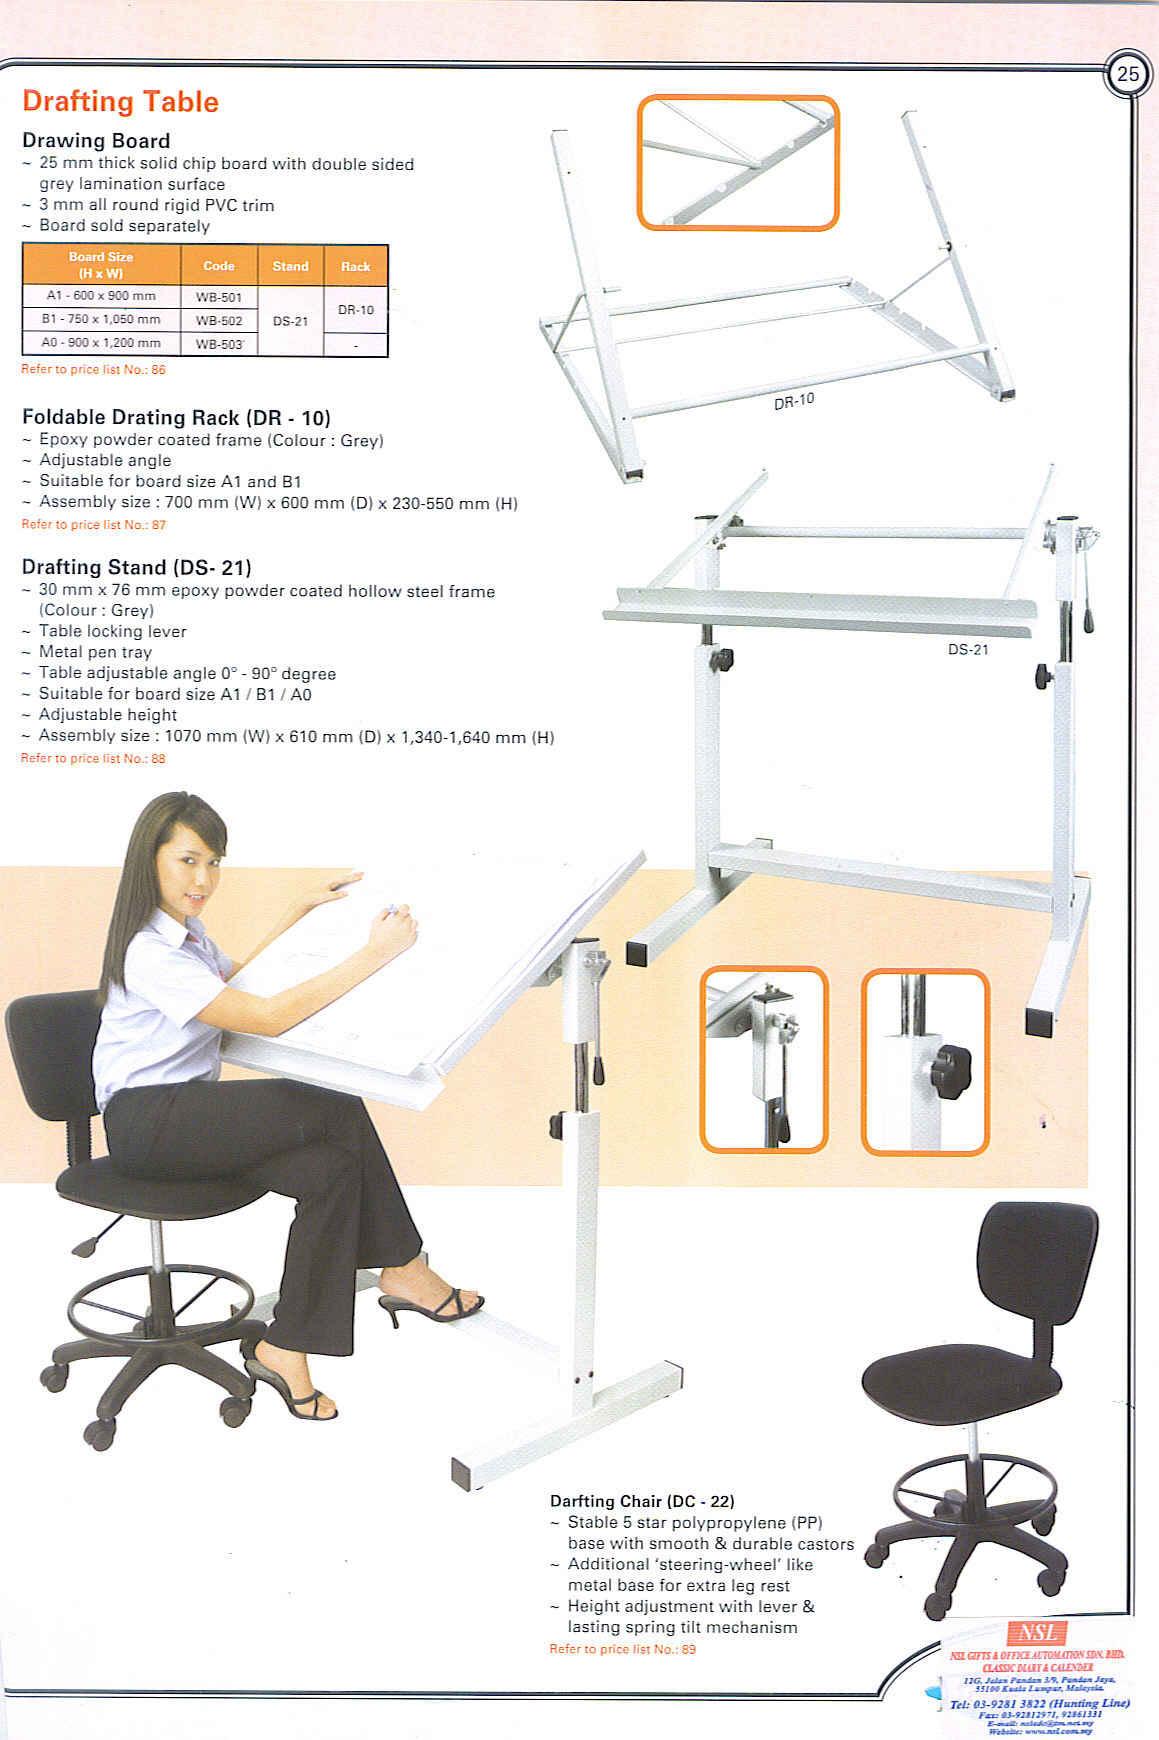 Drafting Equipment - Drafting equipment